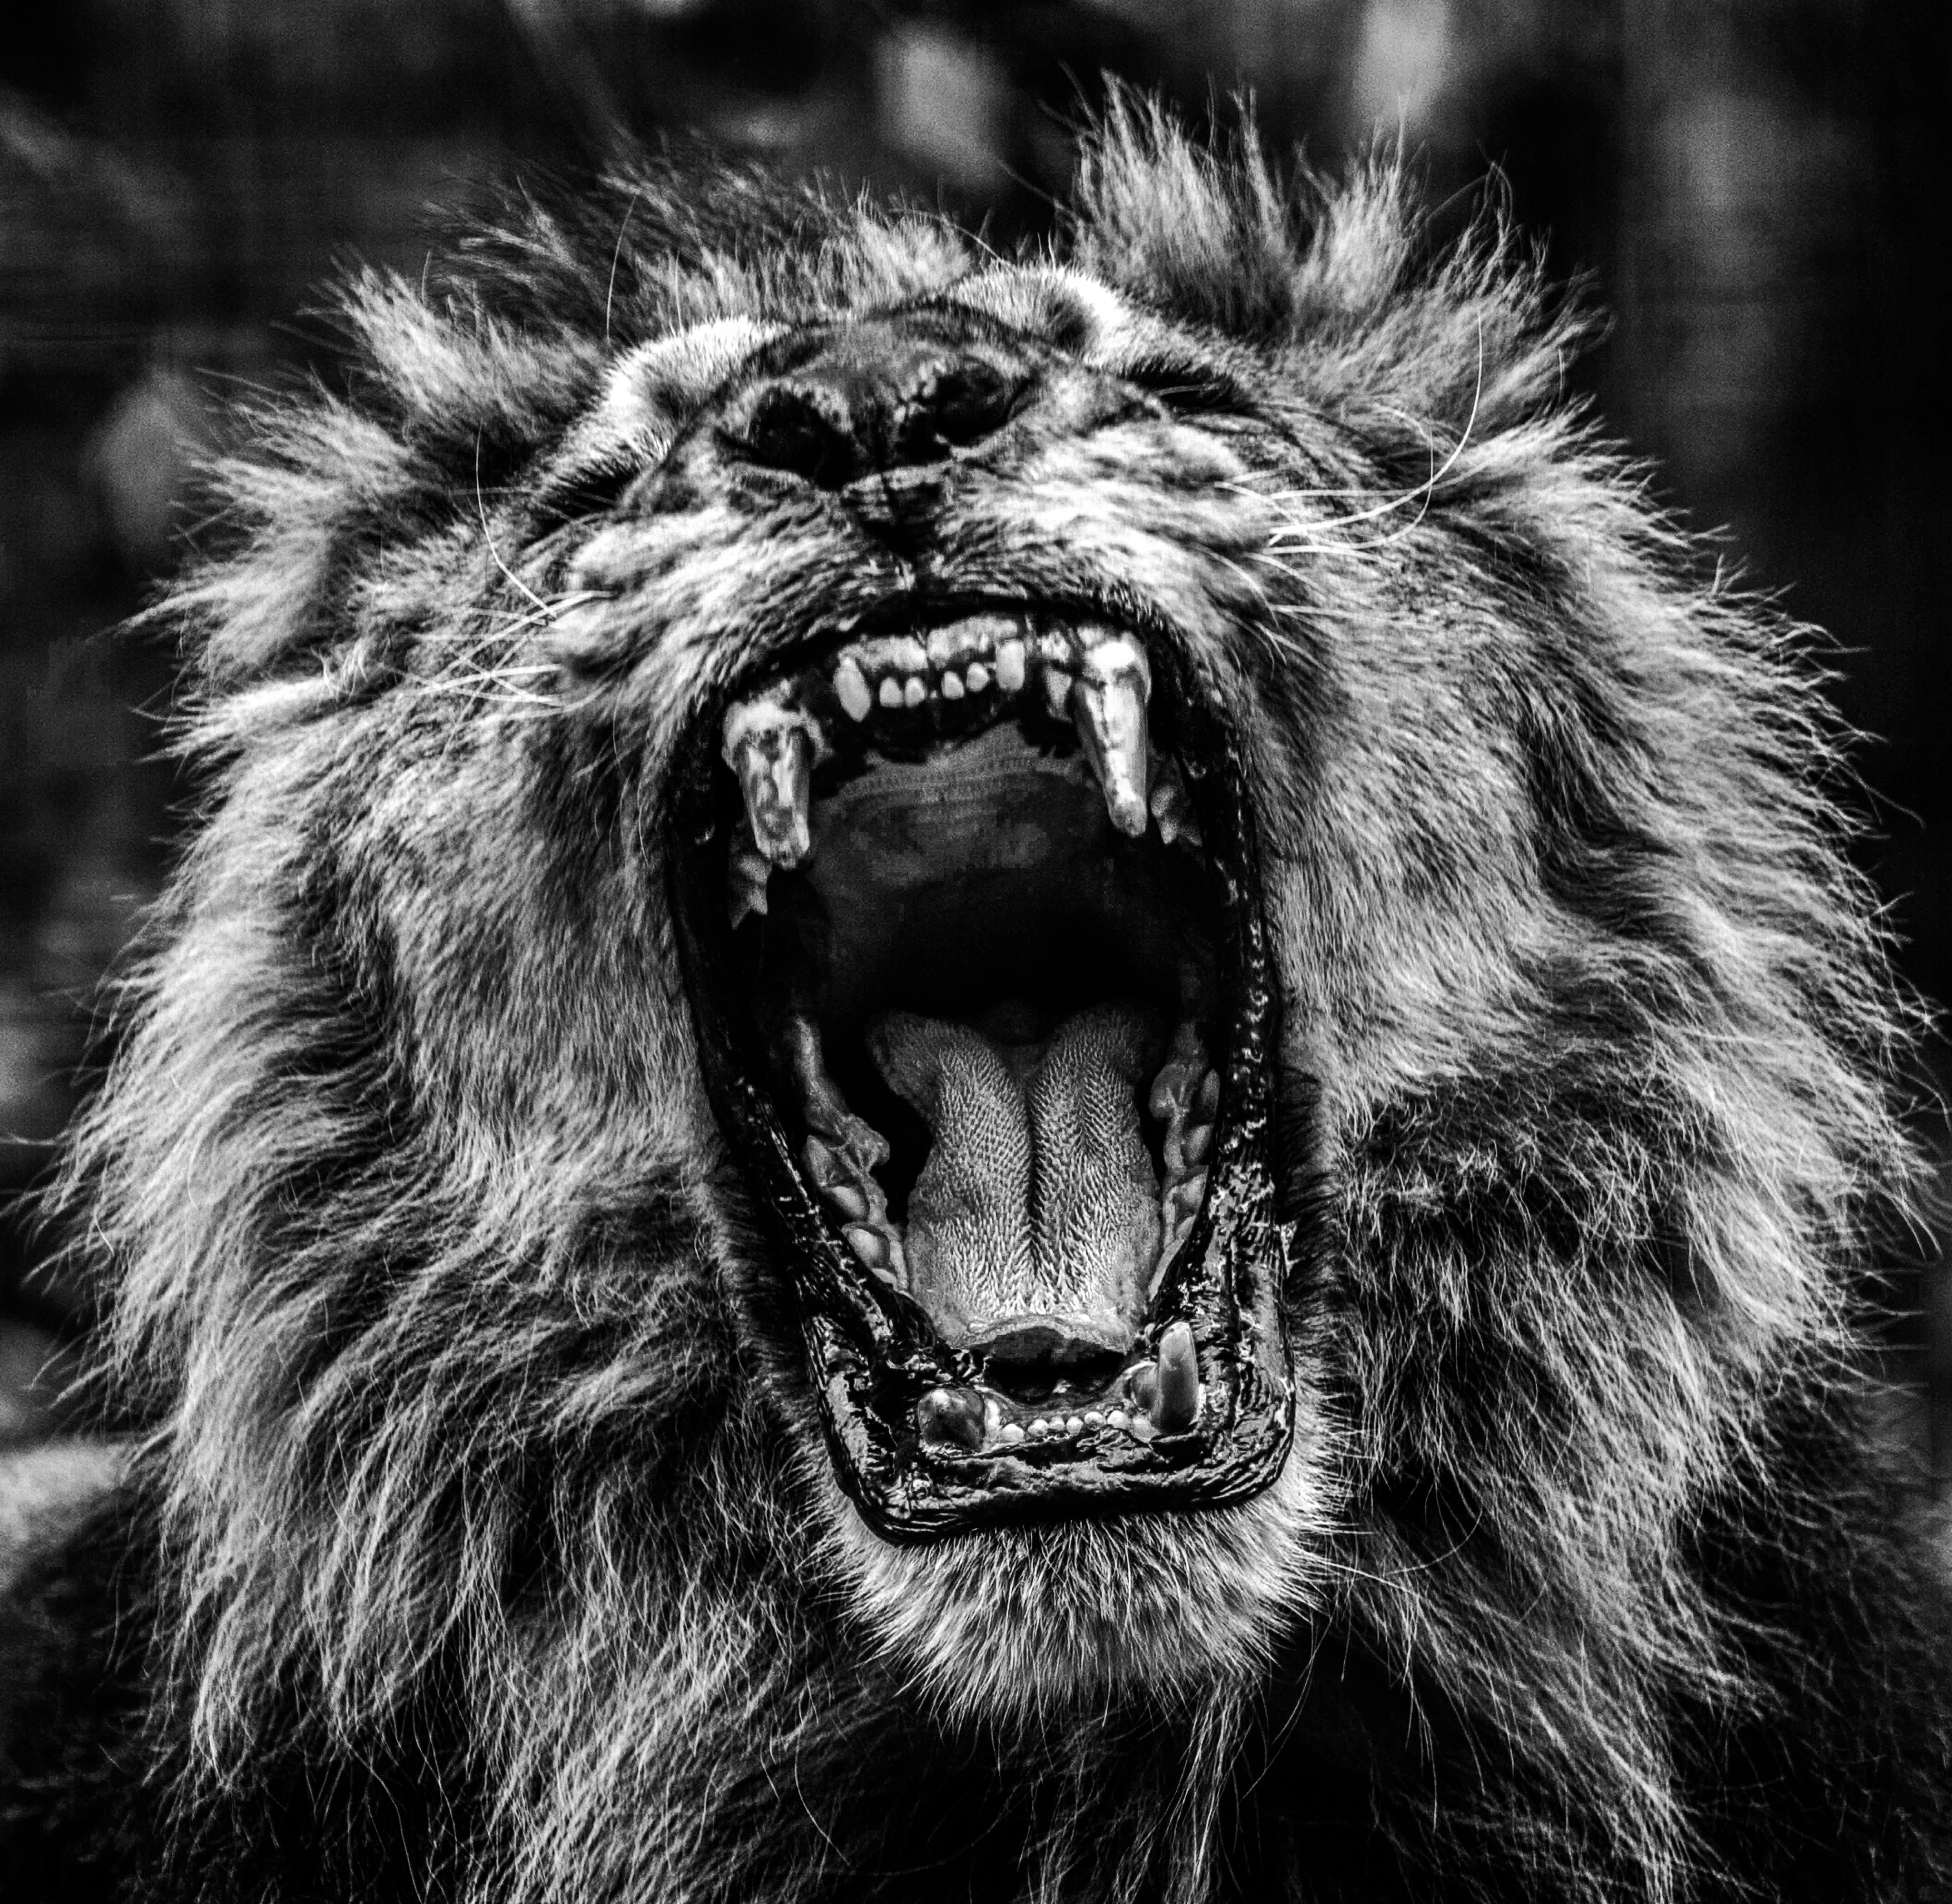 debadier_The lion